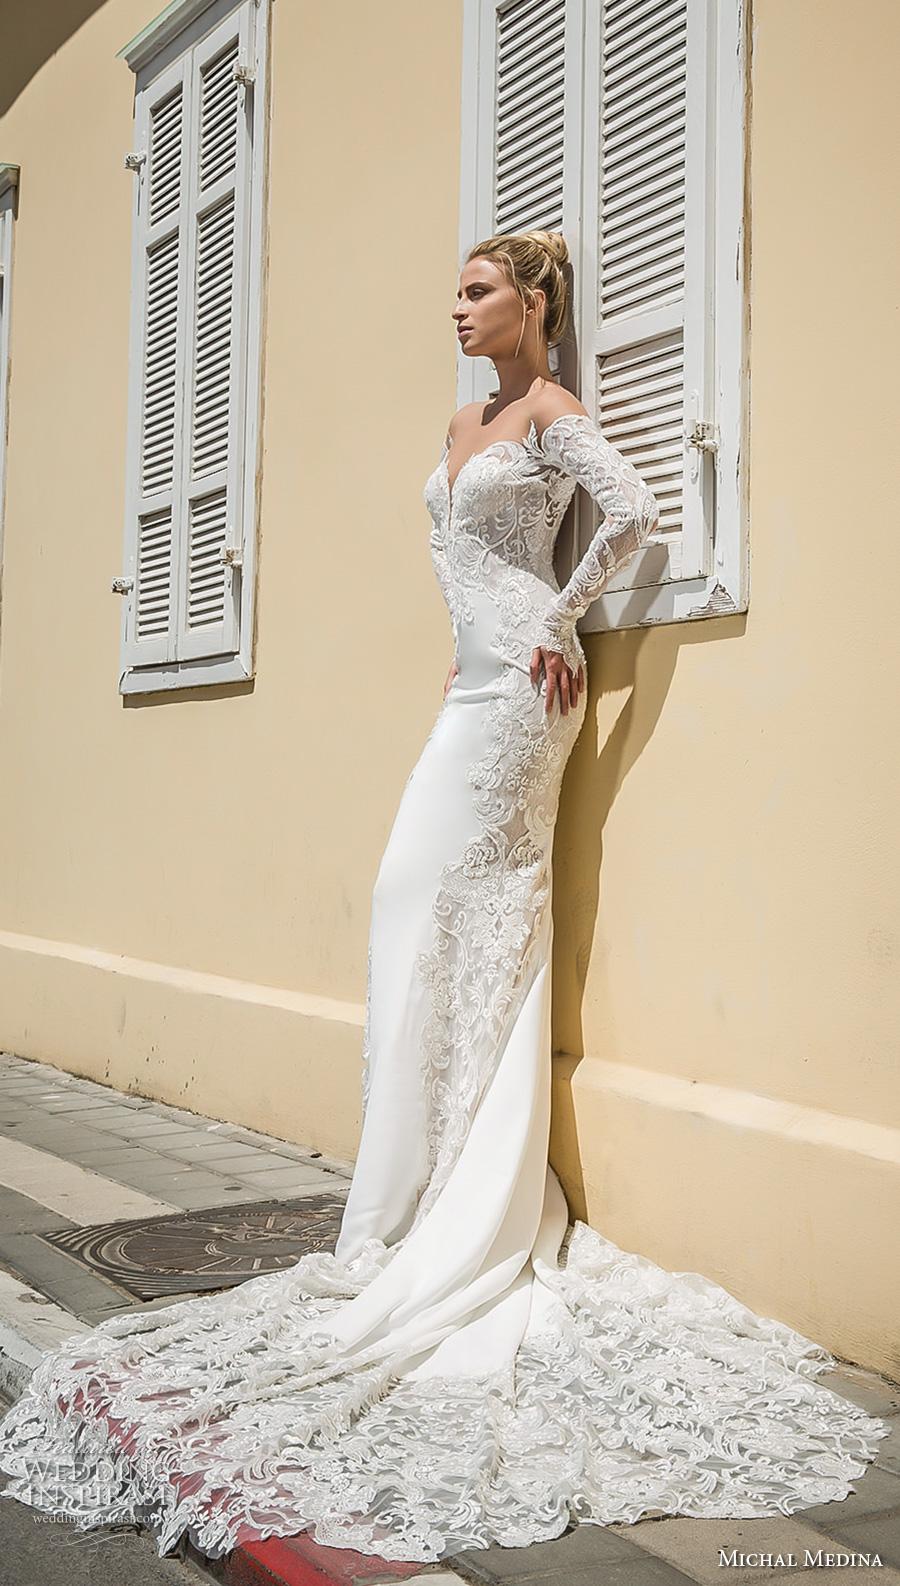 michal medina 2017 bridal off the shoulder long sleeves deep plunging sweetheart neckline heavily embellished bodice elegant sheath wedding dress open low back chapel train (audrey) sdv